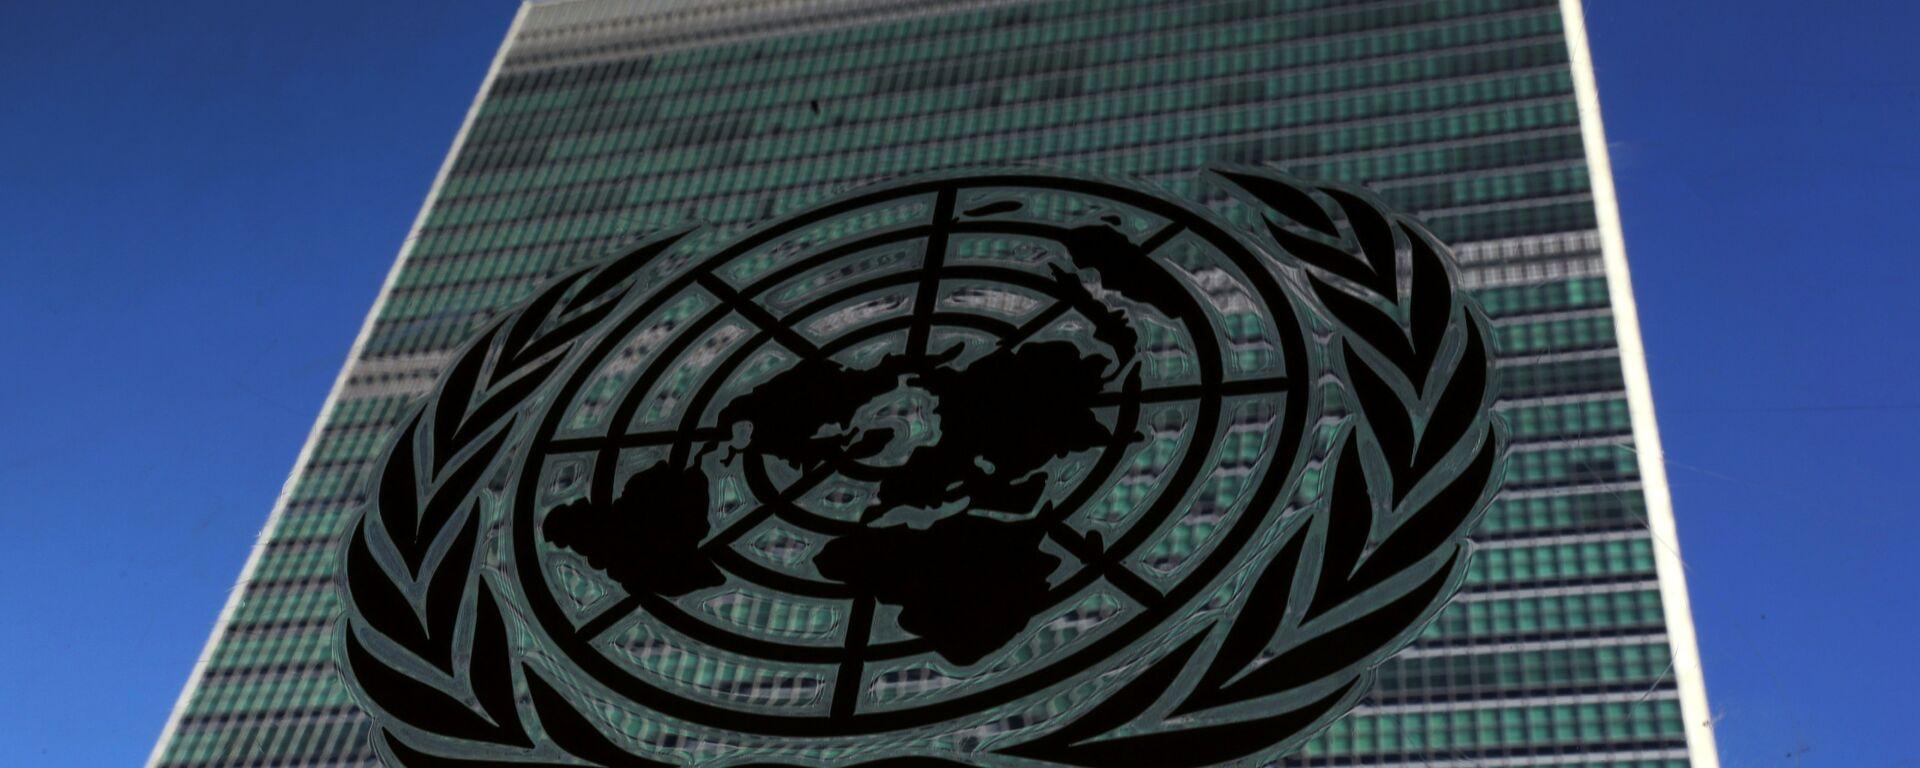 La sede de la ONU - Sputnik Mundo, 1920, 26.08.2021